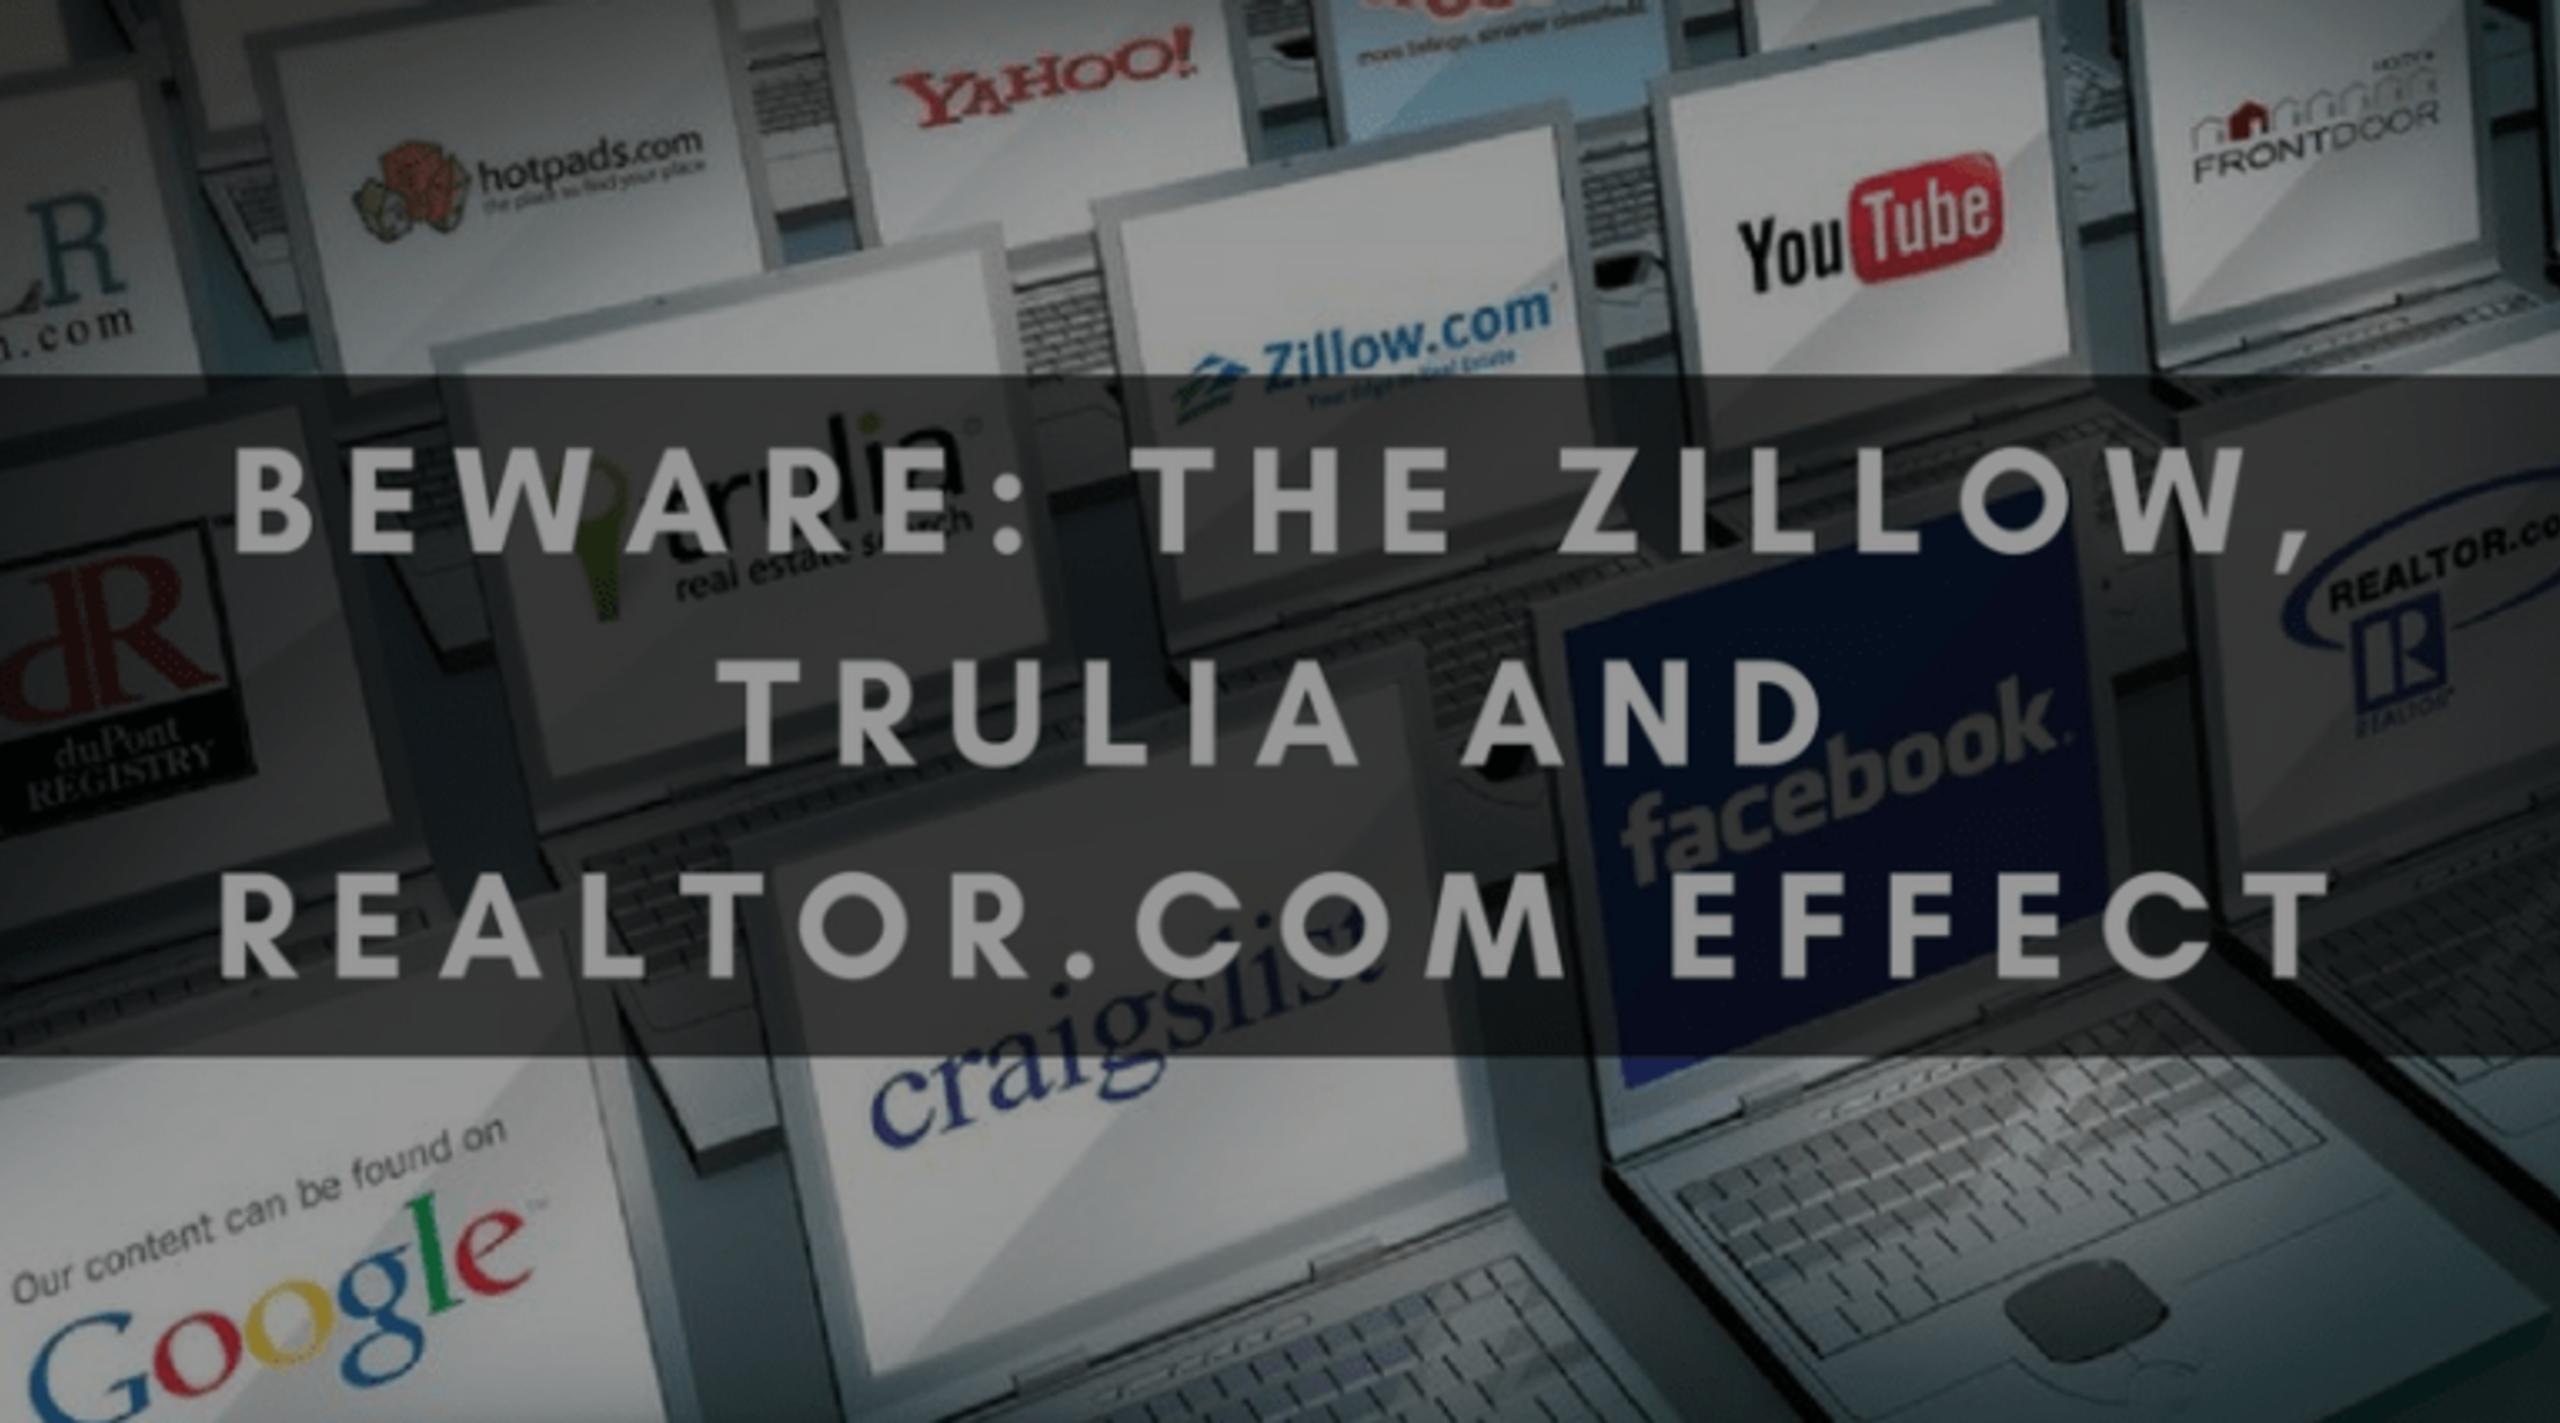 BEWARE: THE ZILLOW, TRULIA AND REALTOR.COM EFFECT